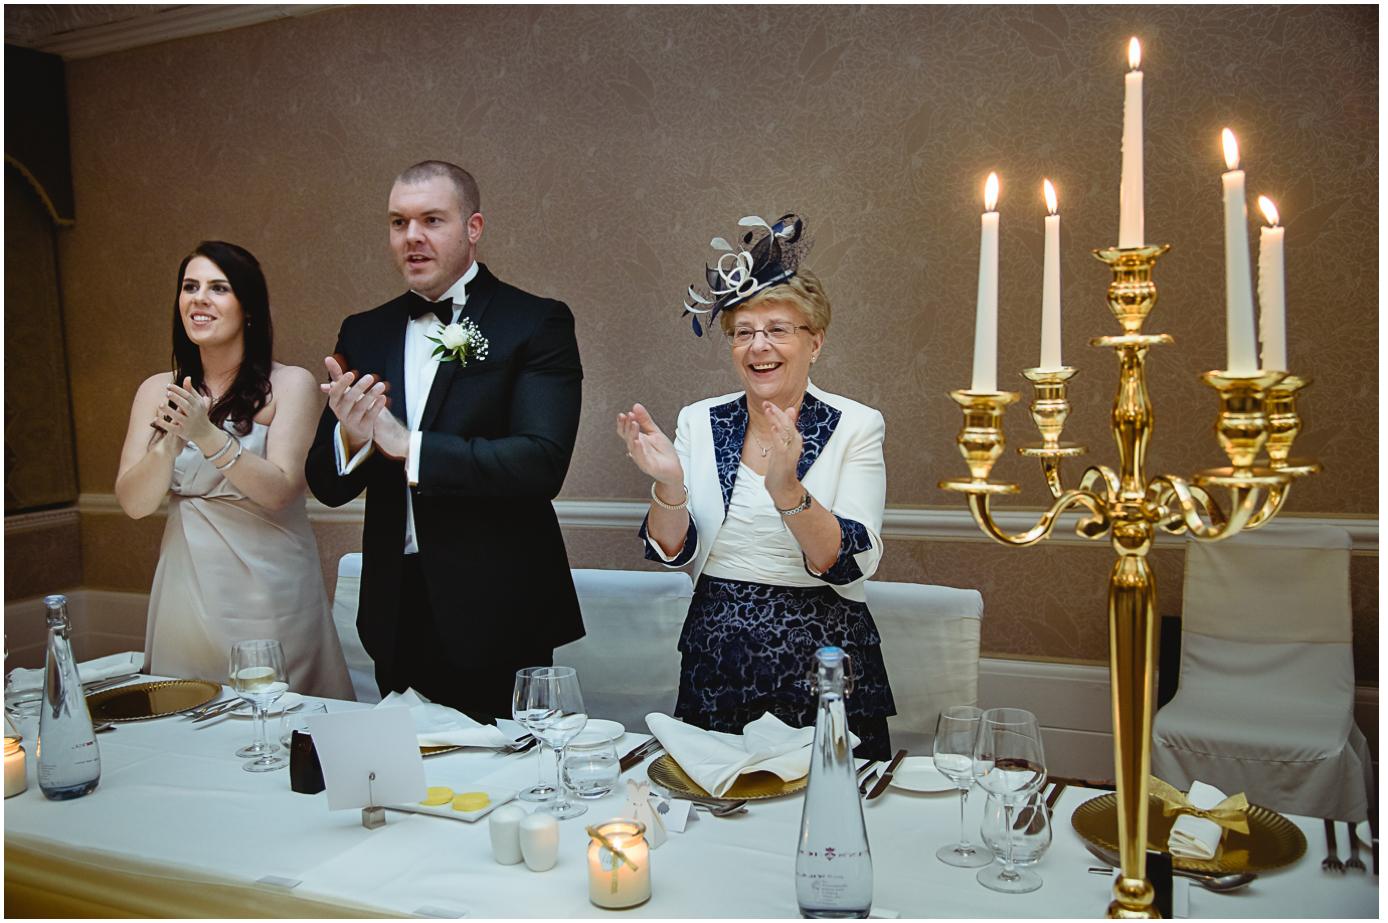 60 - Esmat and Angus - St. Ermin's Hotel London wedding photographer